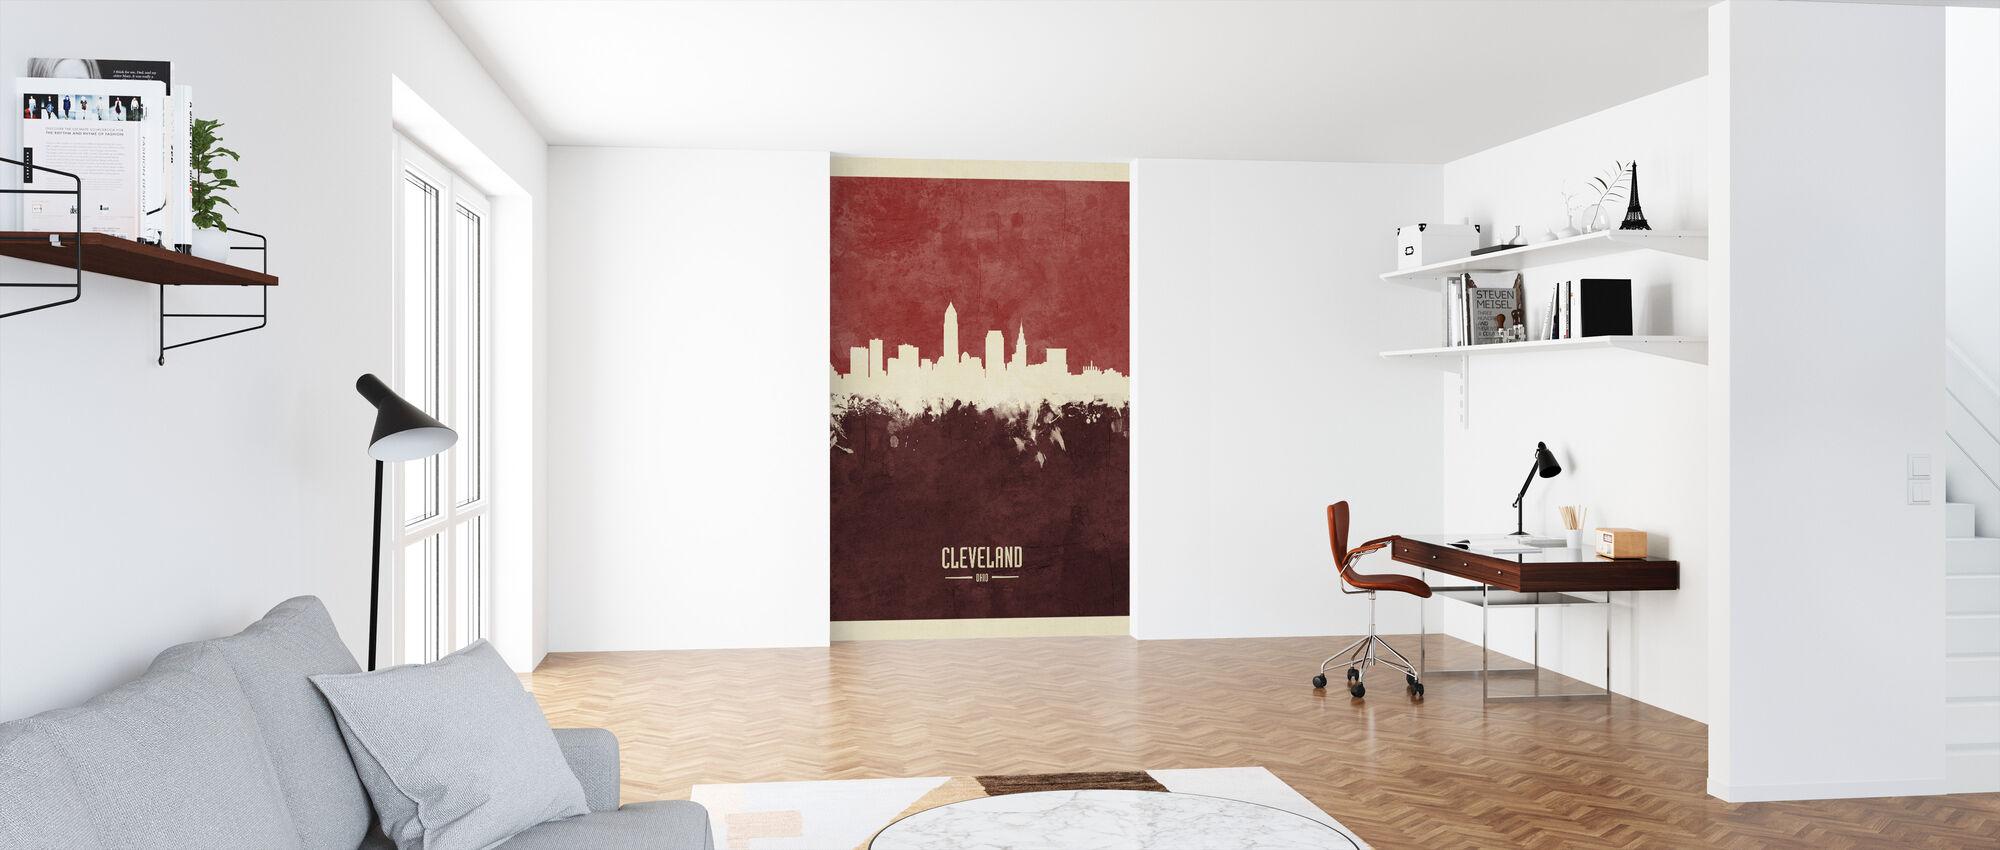 Cleveland Ohio Skyline Rood - Behang - Kantoor